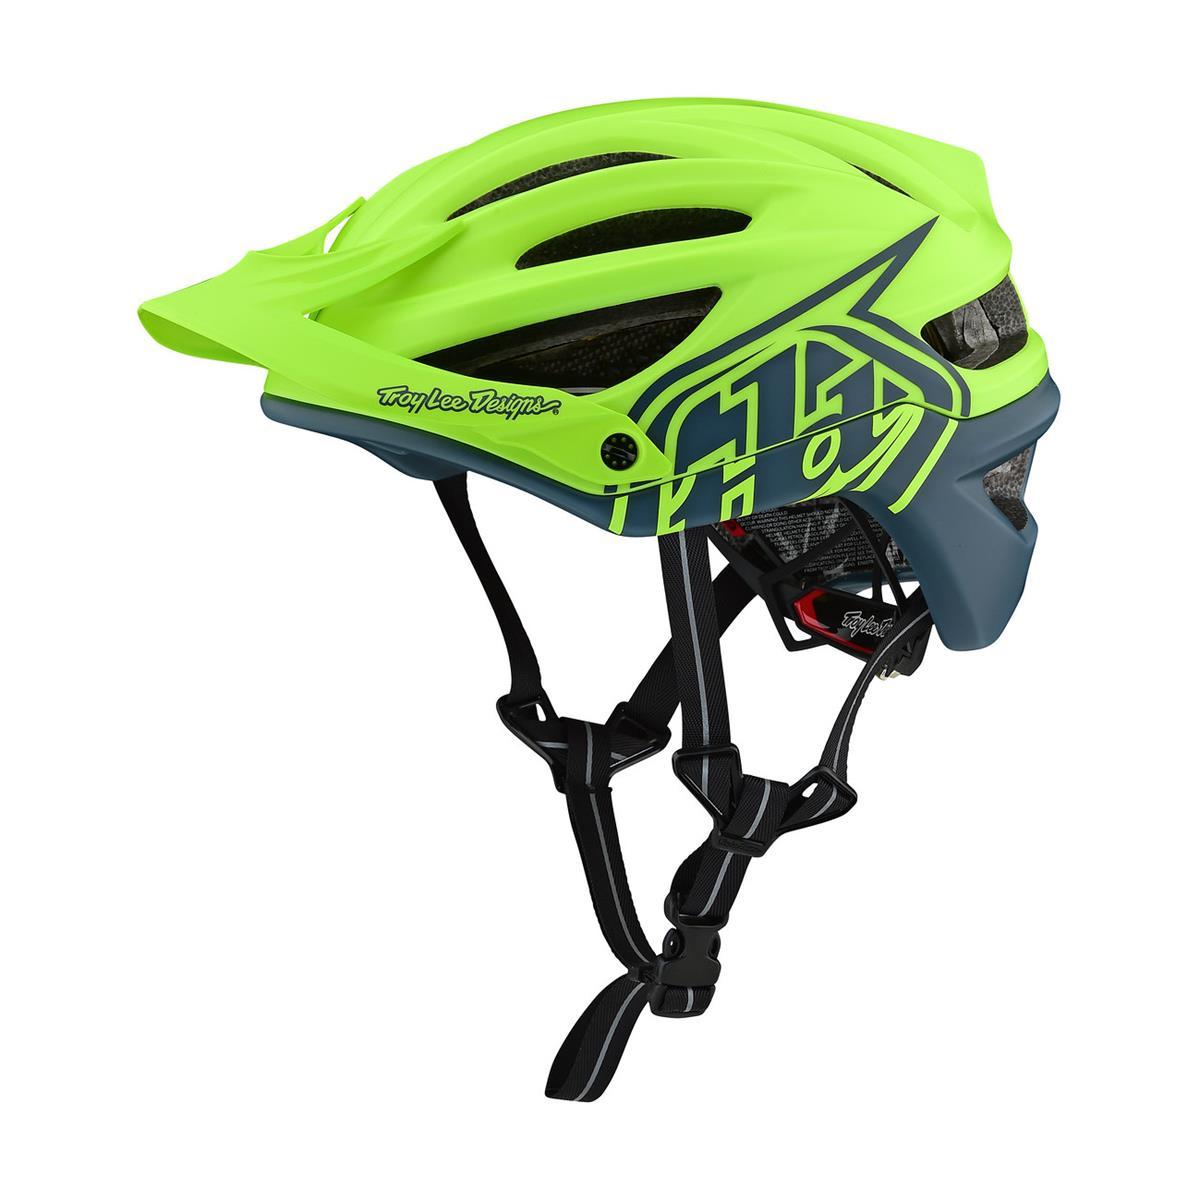 Troy Lee Designs Enduro-MTB Helm A2 MIPS Decoy - Gelb/Air Force Blau